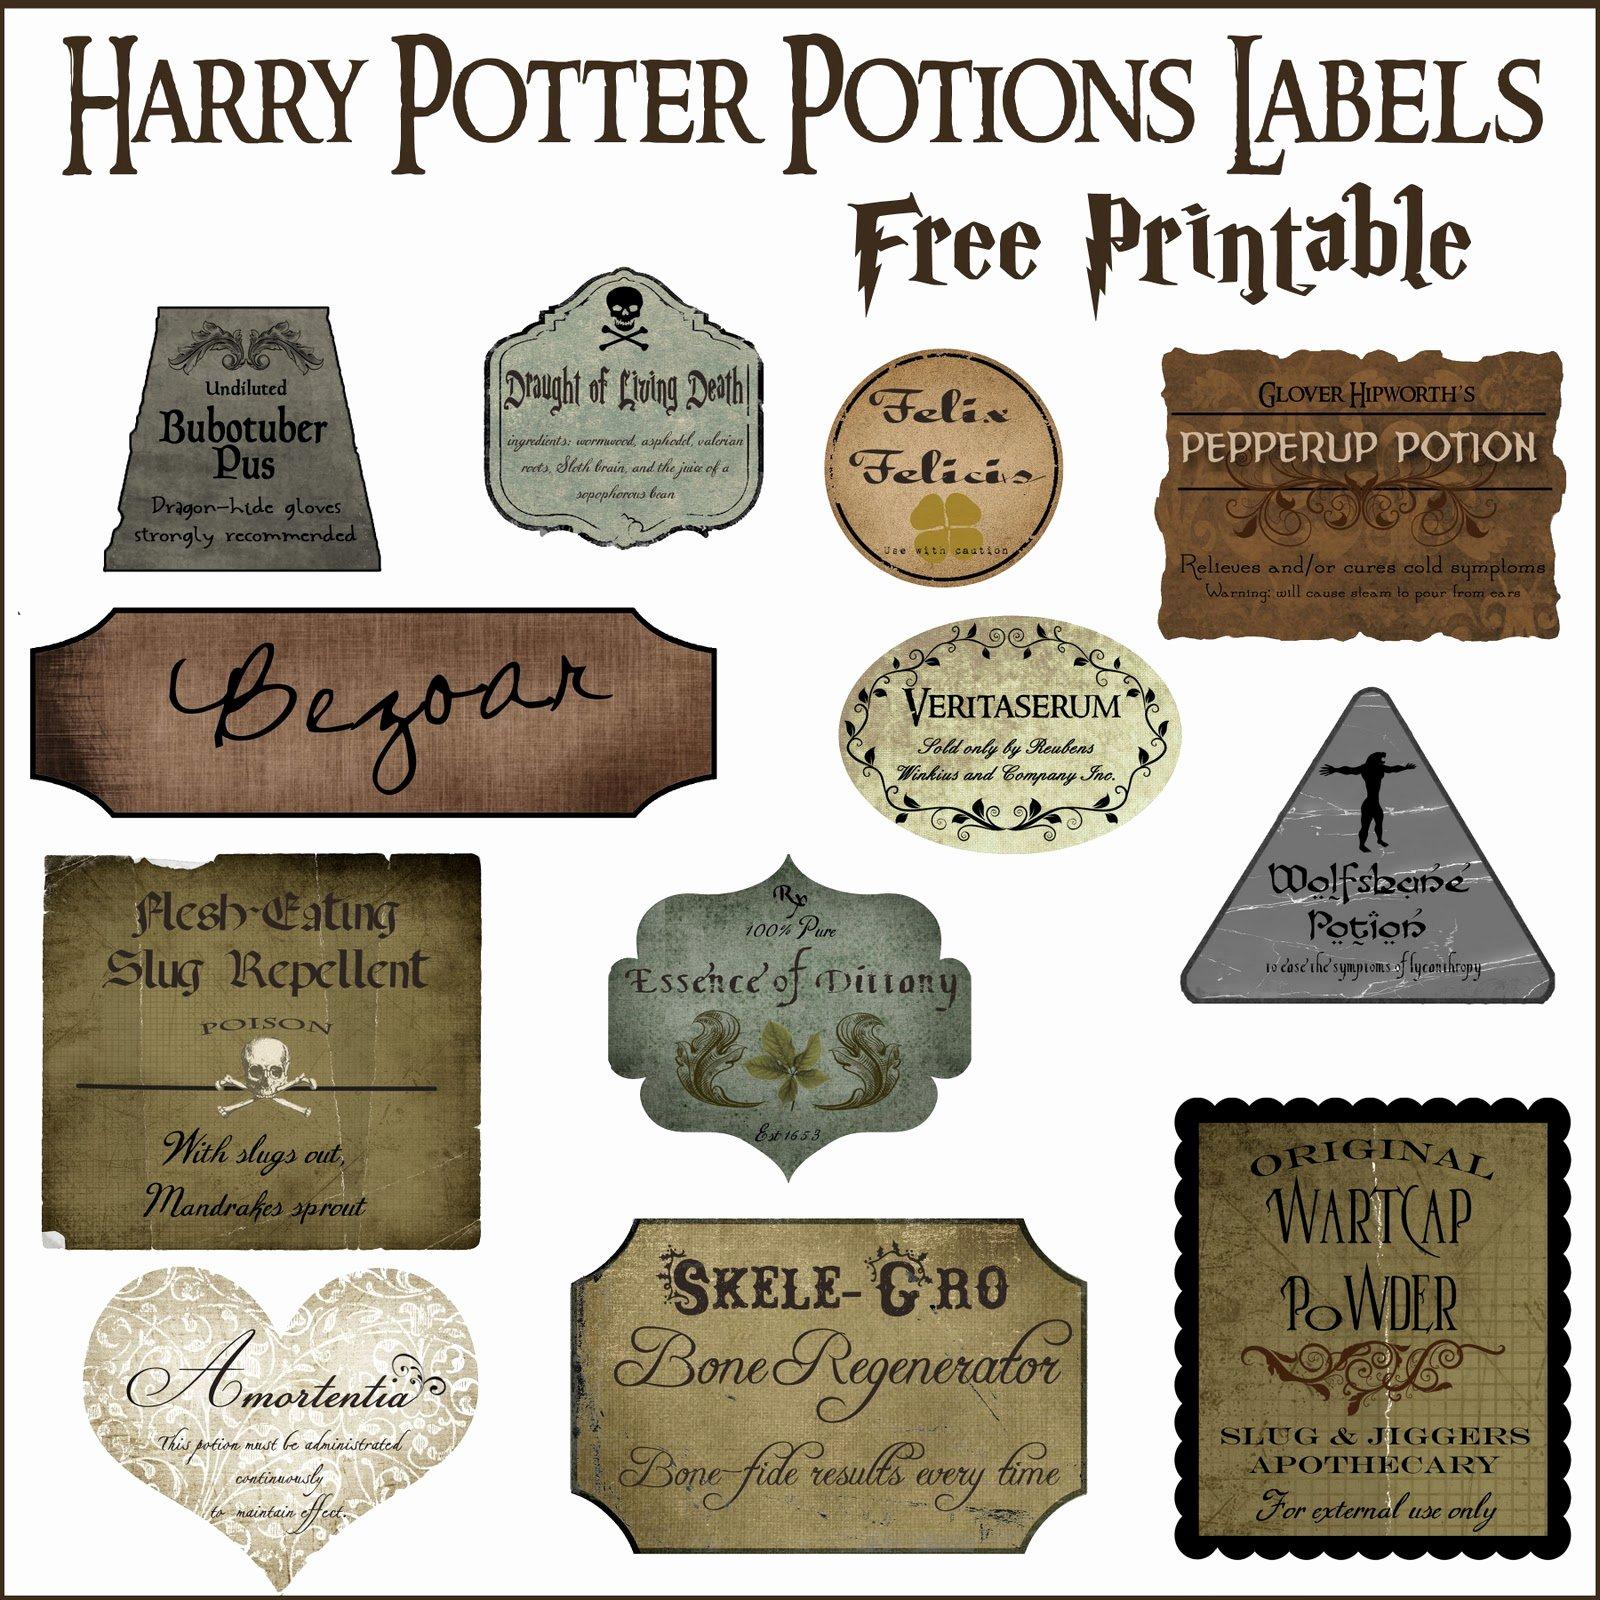 Potion Label Template Lovely Harry Potter Potion Label Printables